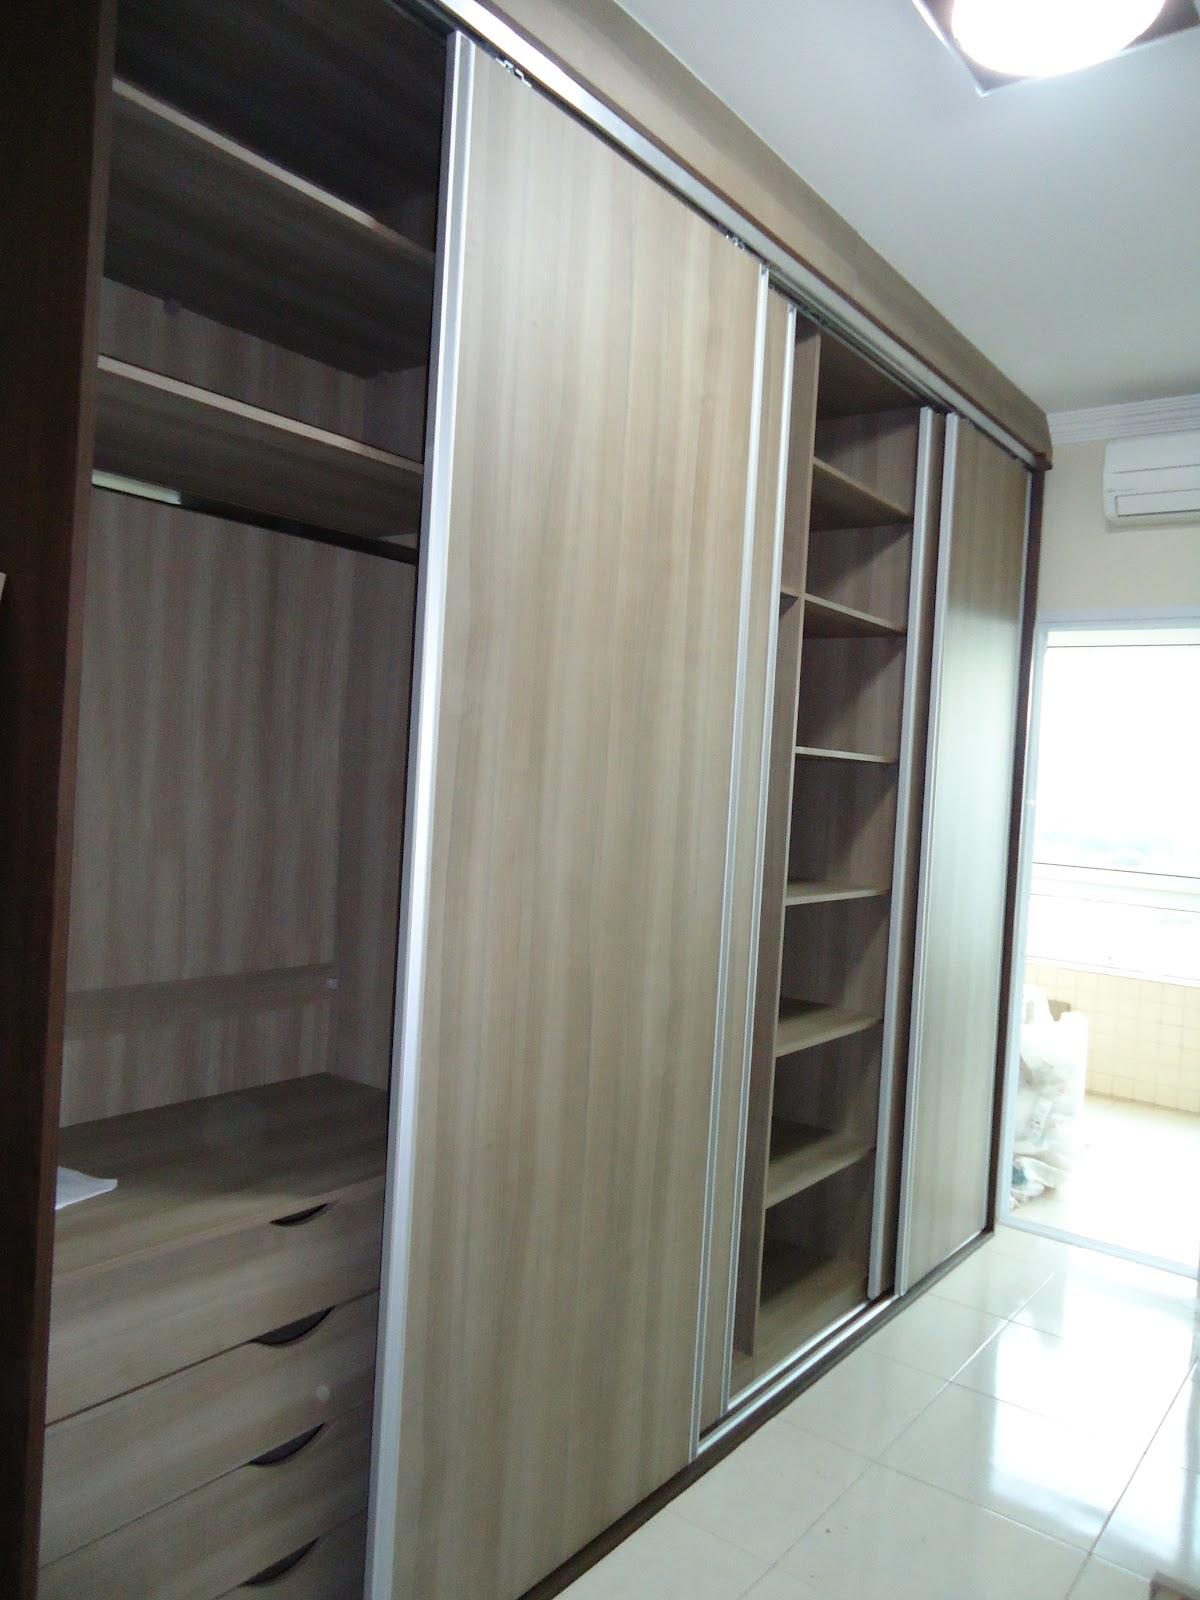 para quarto solteiro modulado guarda roupa porta canto escrivaninha #726E59 1200x1600